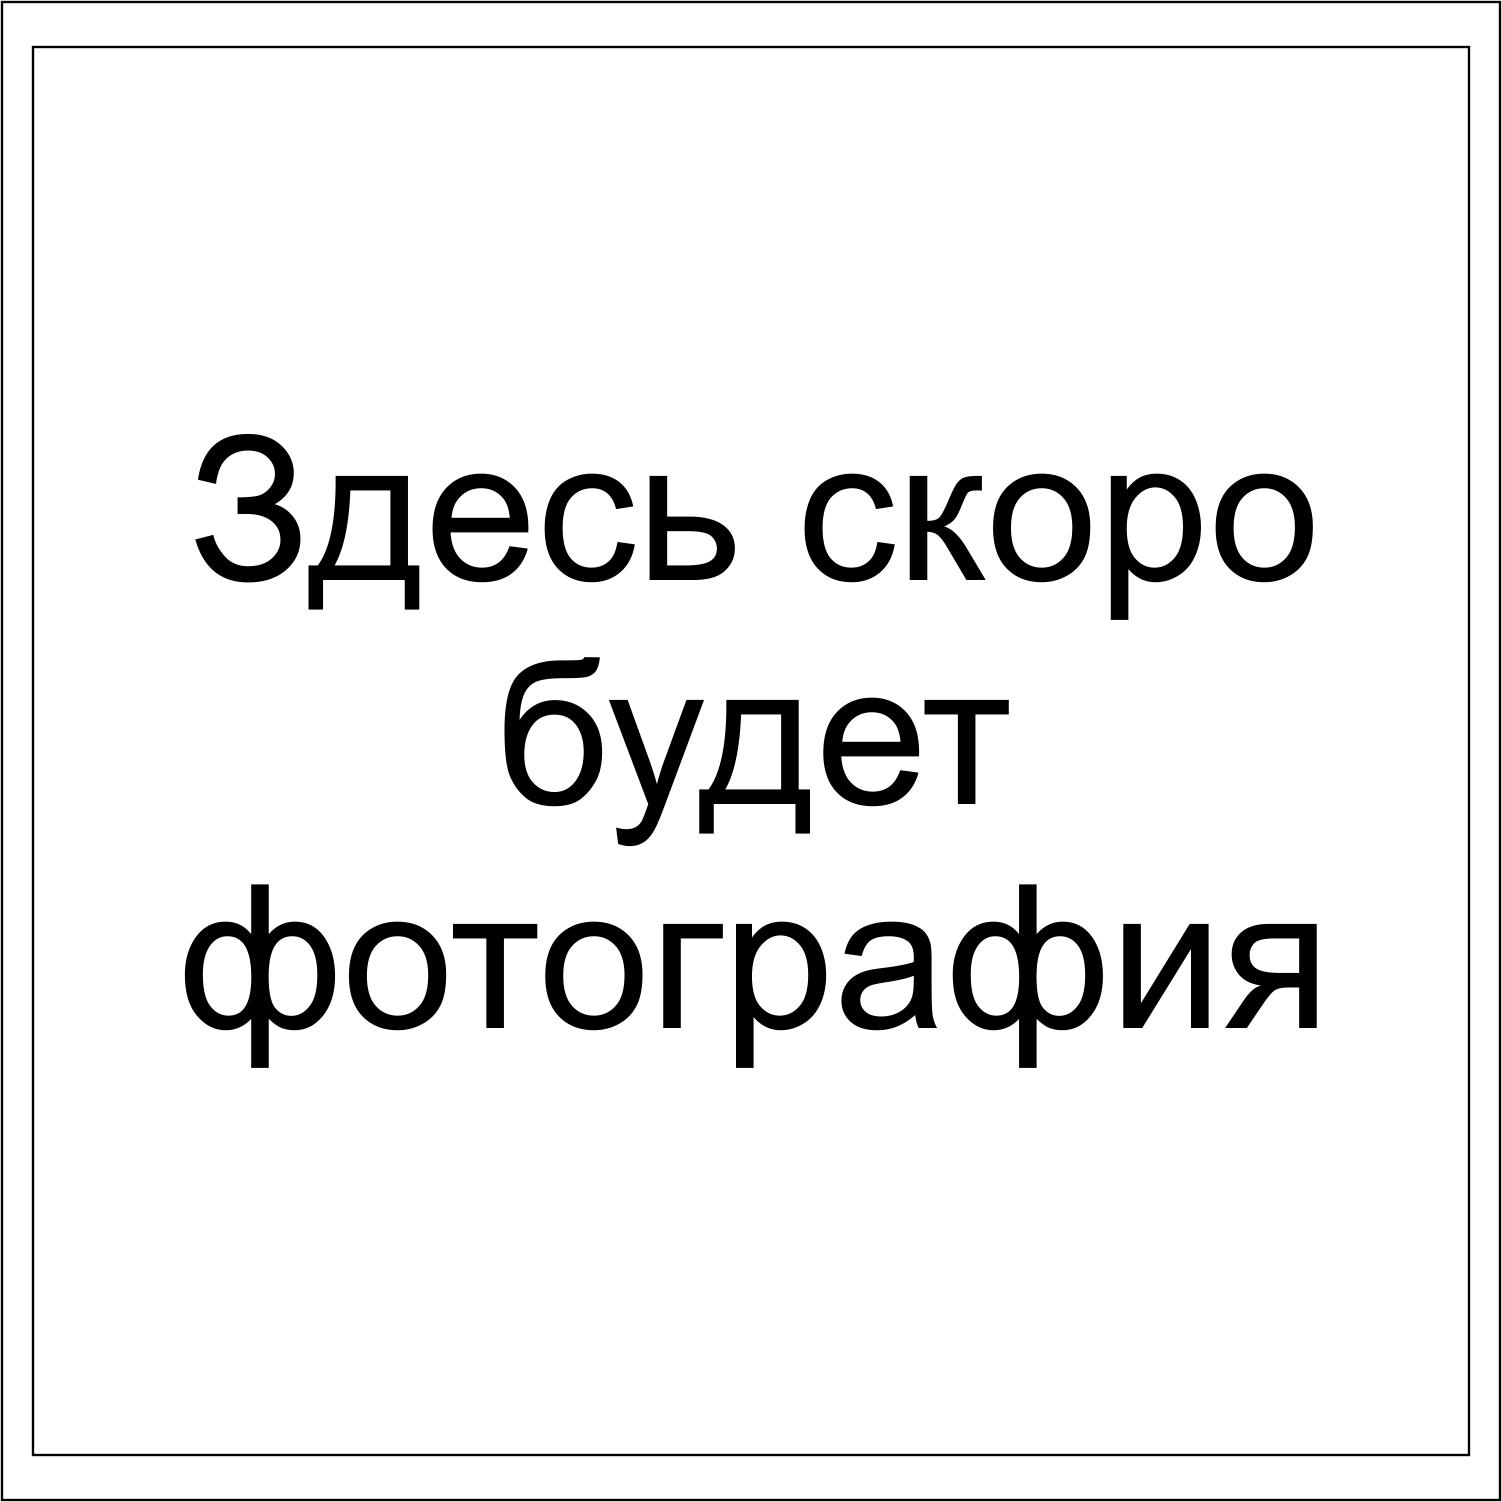 Ветка Гипсофила мелк.